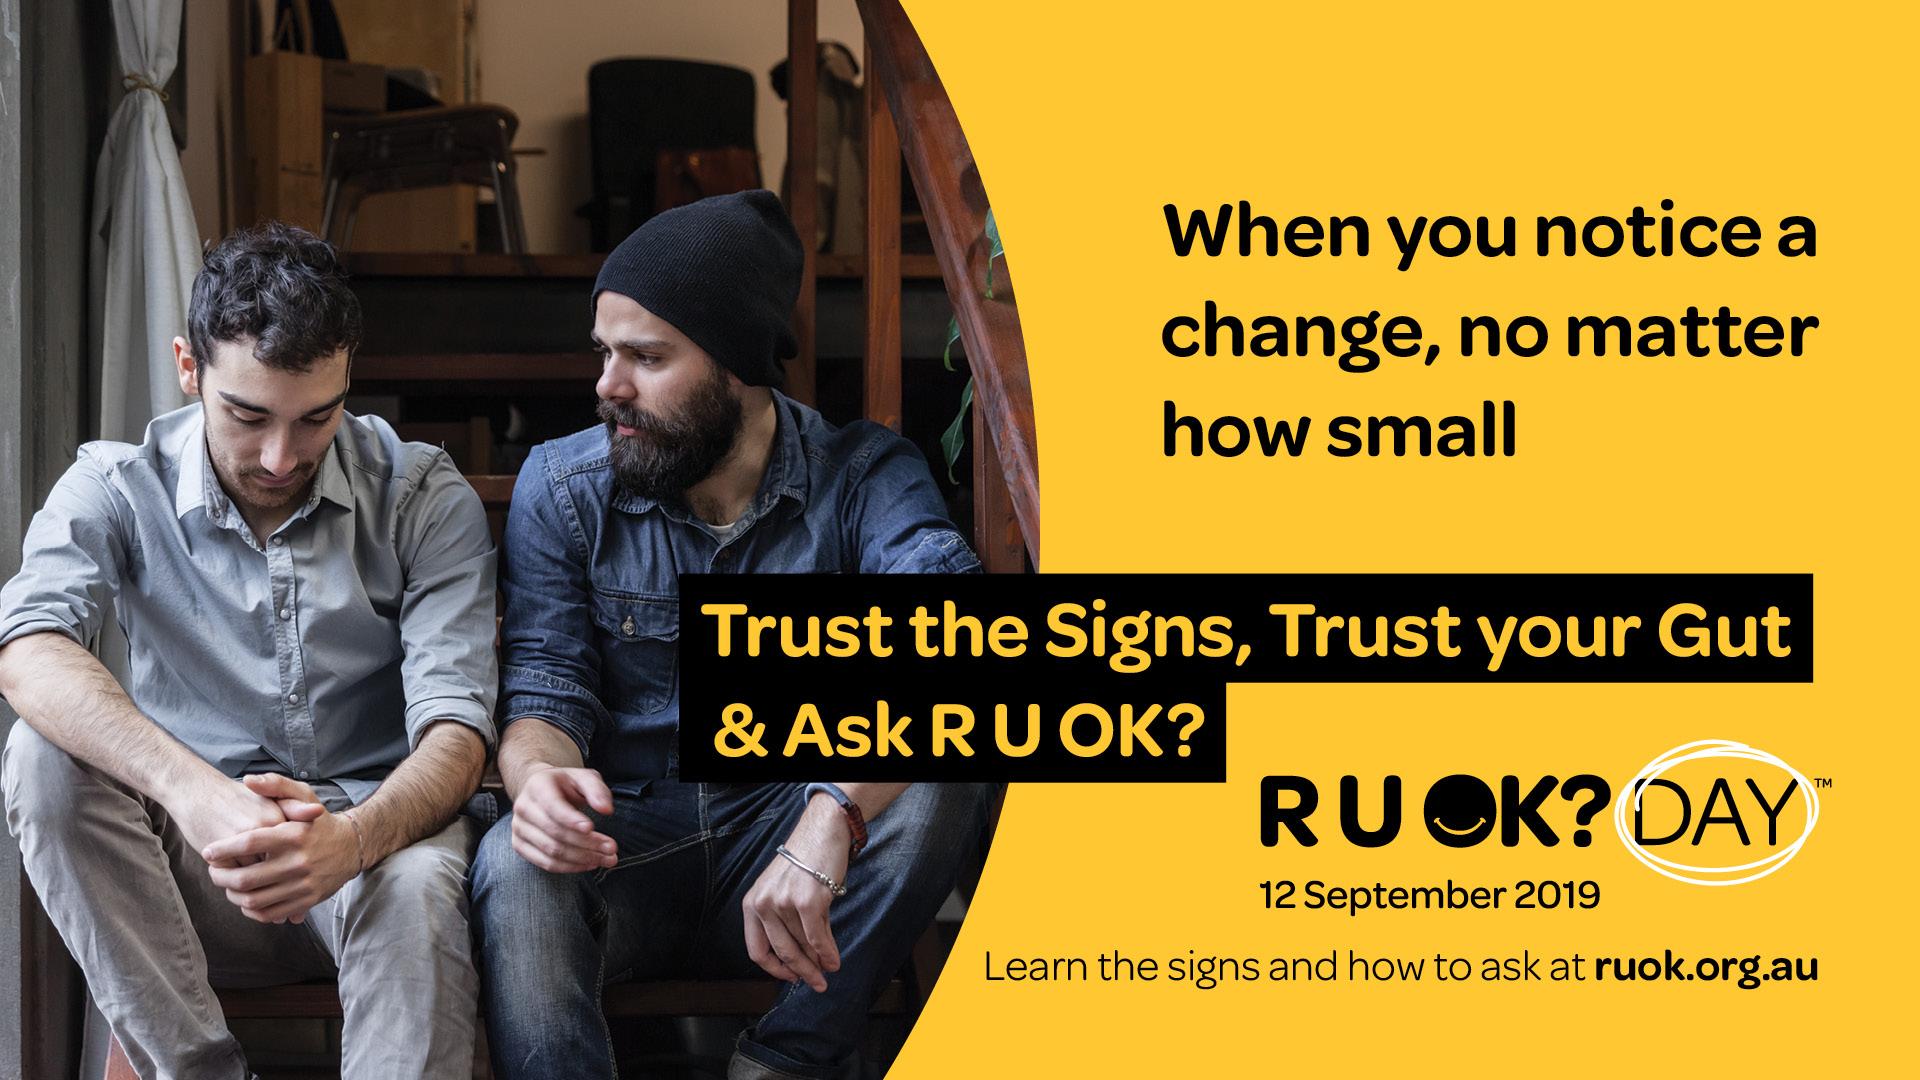 RUOK_TrustTheSigns_SocialMediaTiles_1920x1080_Final.jpg